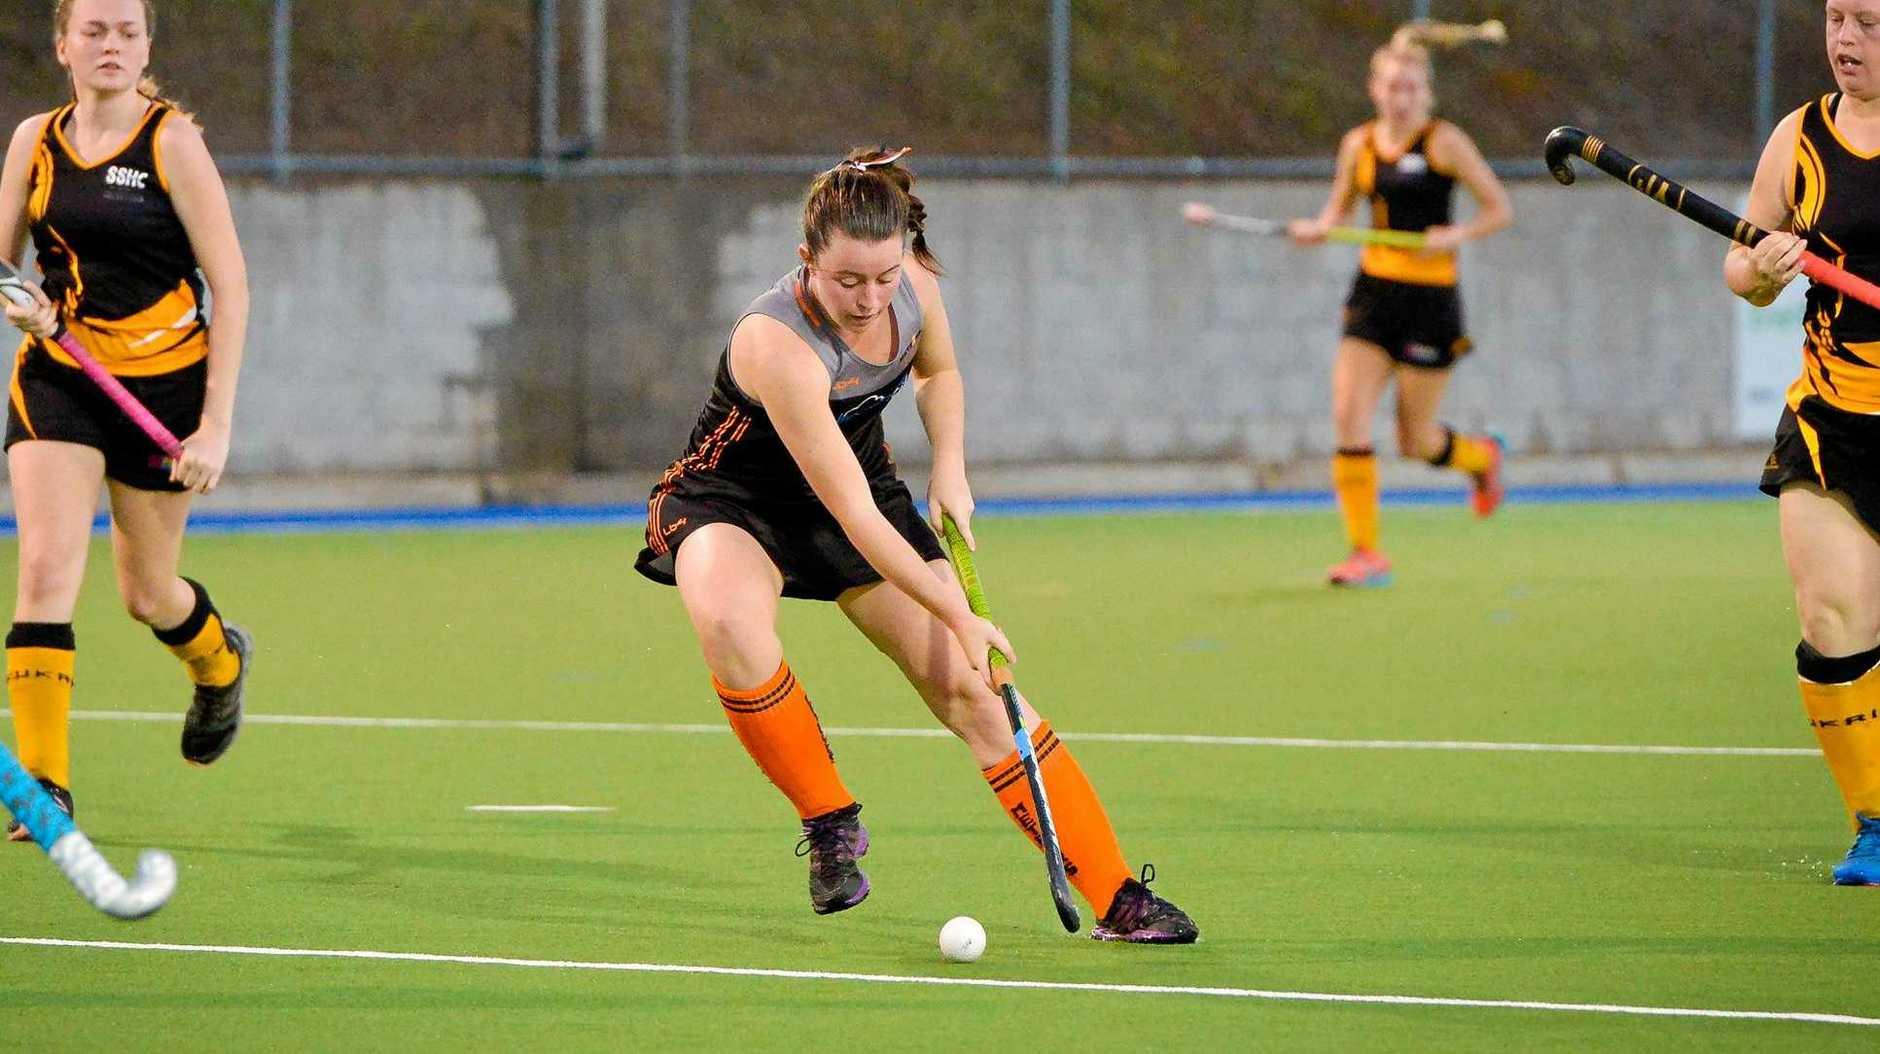 Meteors Kellie Pagel.Womans A1 hockey grand final - Gladstone Meteors vs Rockhampton Souths.